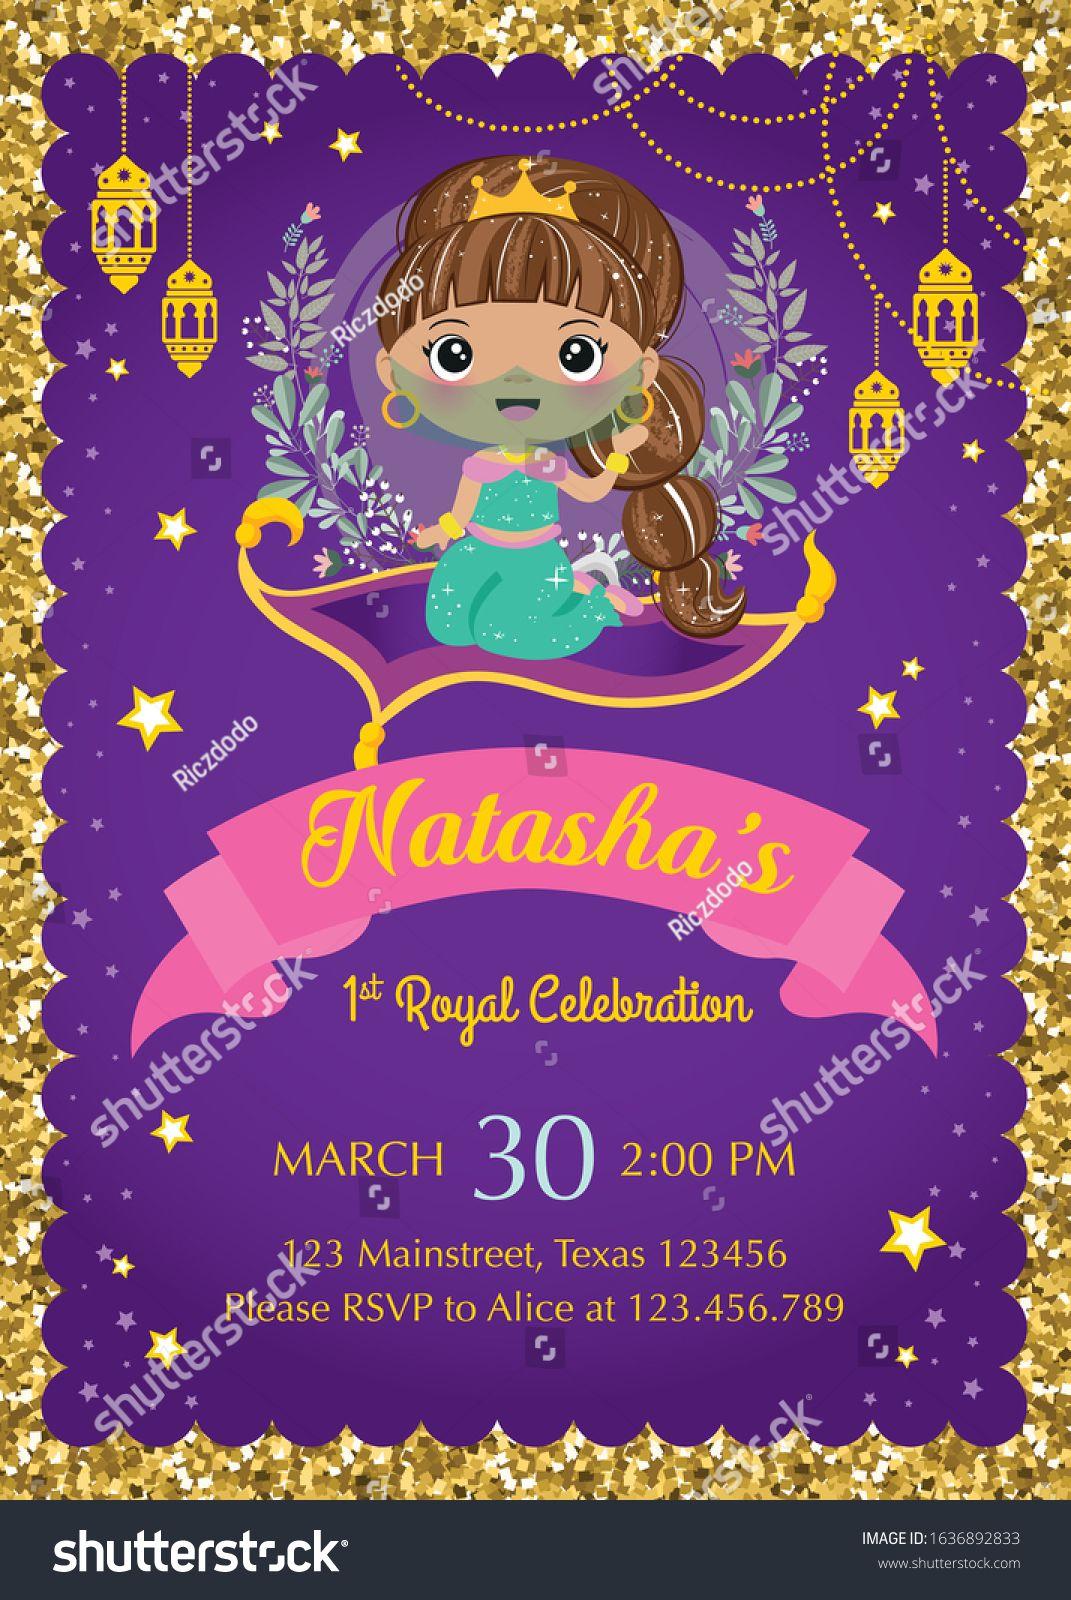 Shutterstock Arabian Princess Vector Invitation Birthday Baby Shower Night 1001 Lamp Aladdin Jasmine Card Partyidea Girl Royal Magic Carpet Di 2020